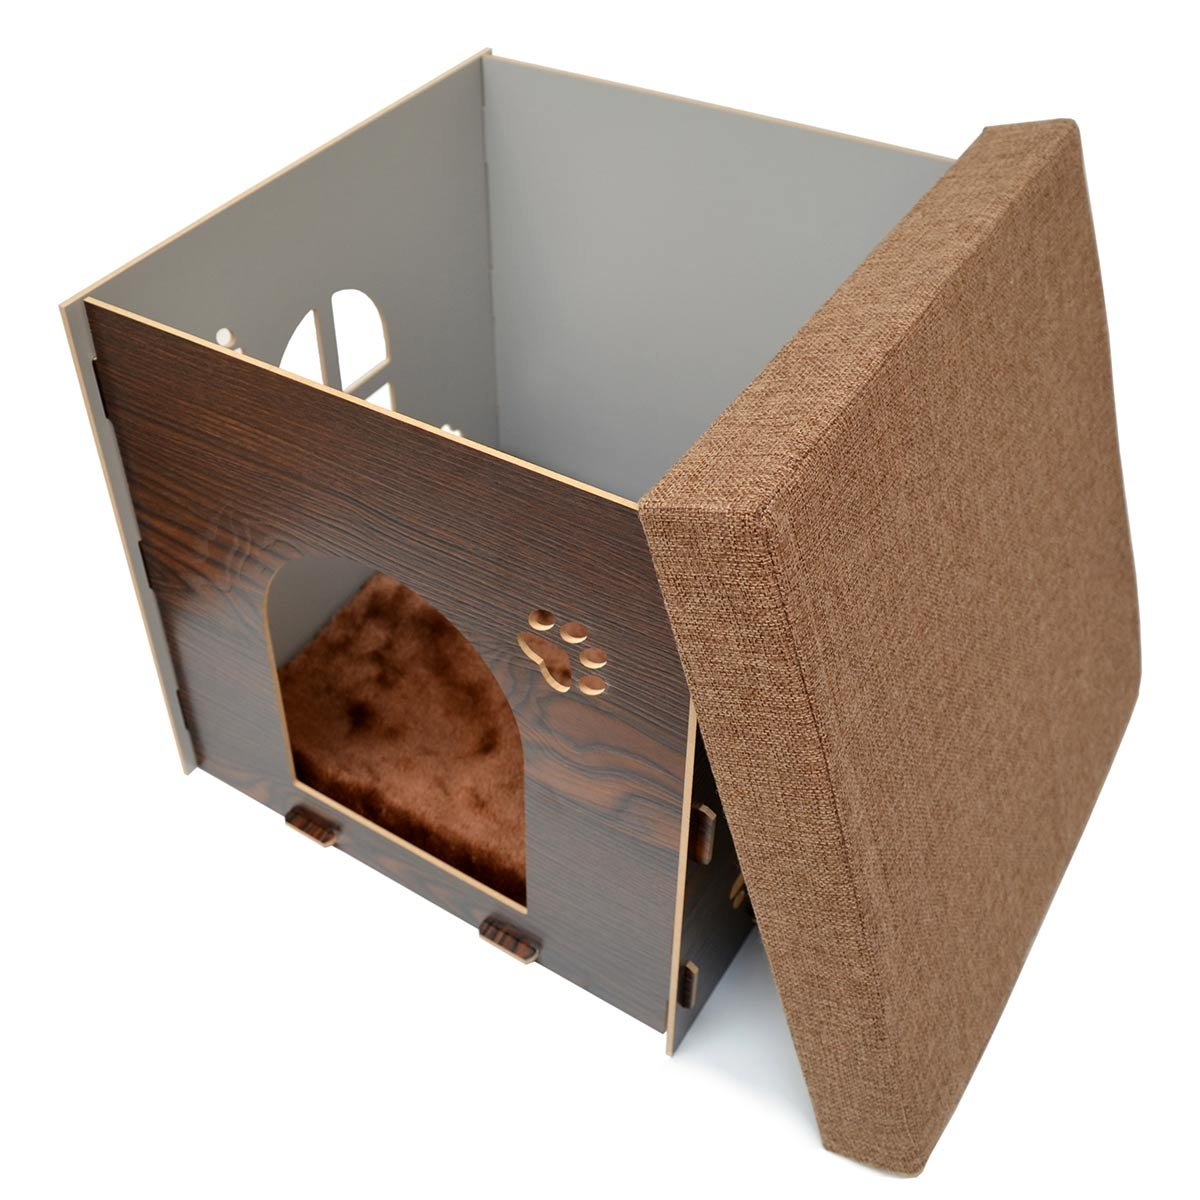 eyepower Caseta para Perro Gato 41x41x41cm talla mediana M cama caja cuadrada para mascota con tapa acolchada para sentarse puf escabel Marrón: Amazon.es: ...